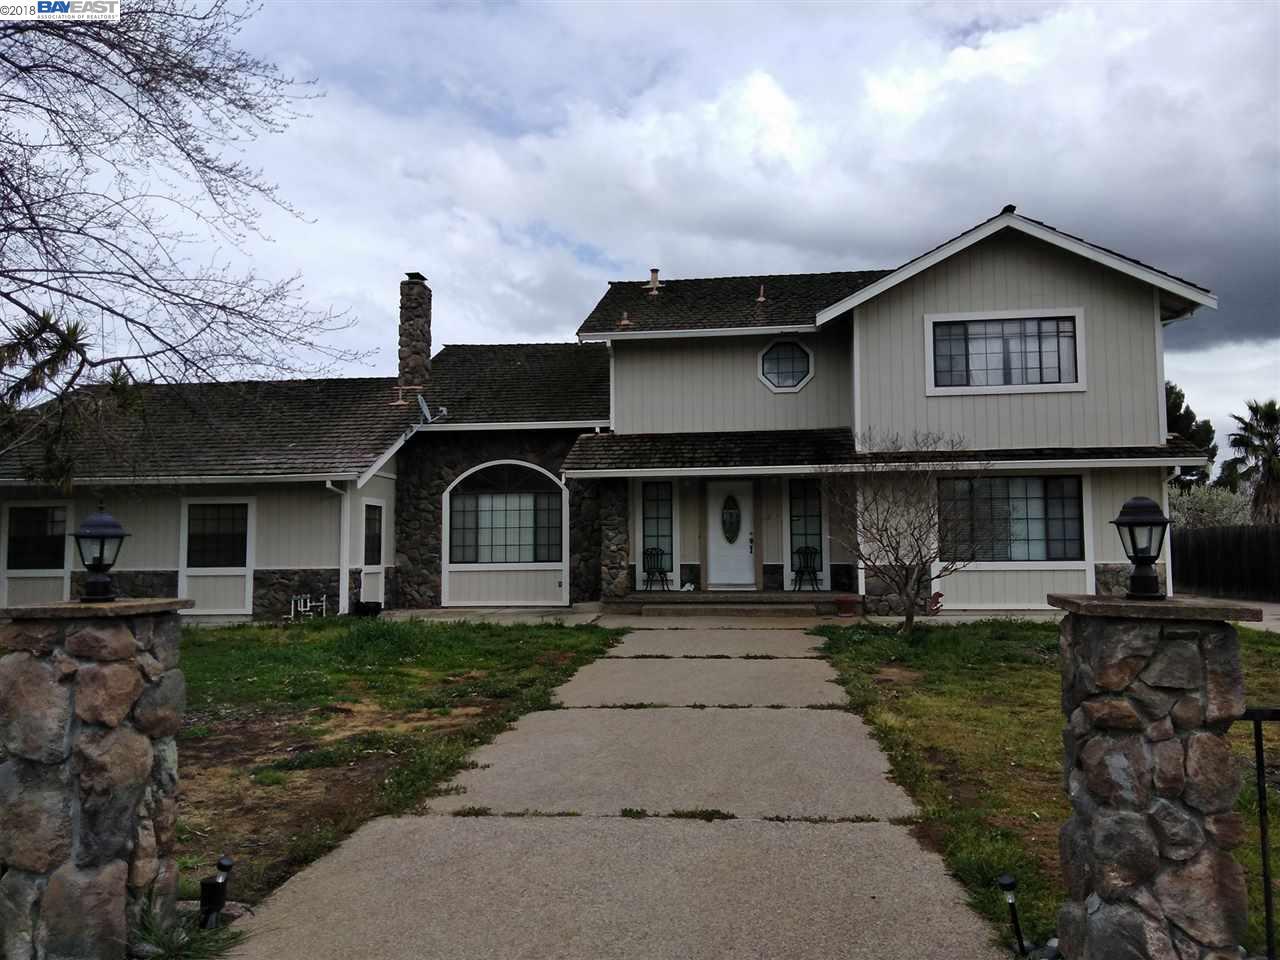 Casa Unifamiliar por un Venta en 4826 Calle De Oro 4826 Calle De Oro Oakley, California 94561 Estados Unidos